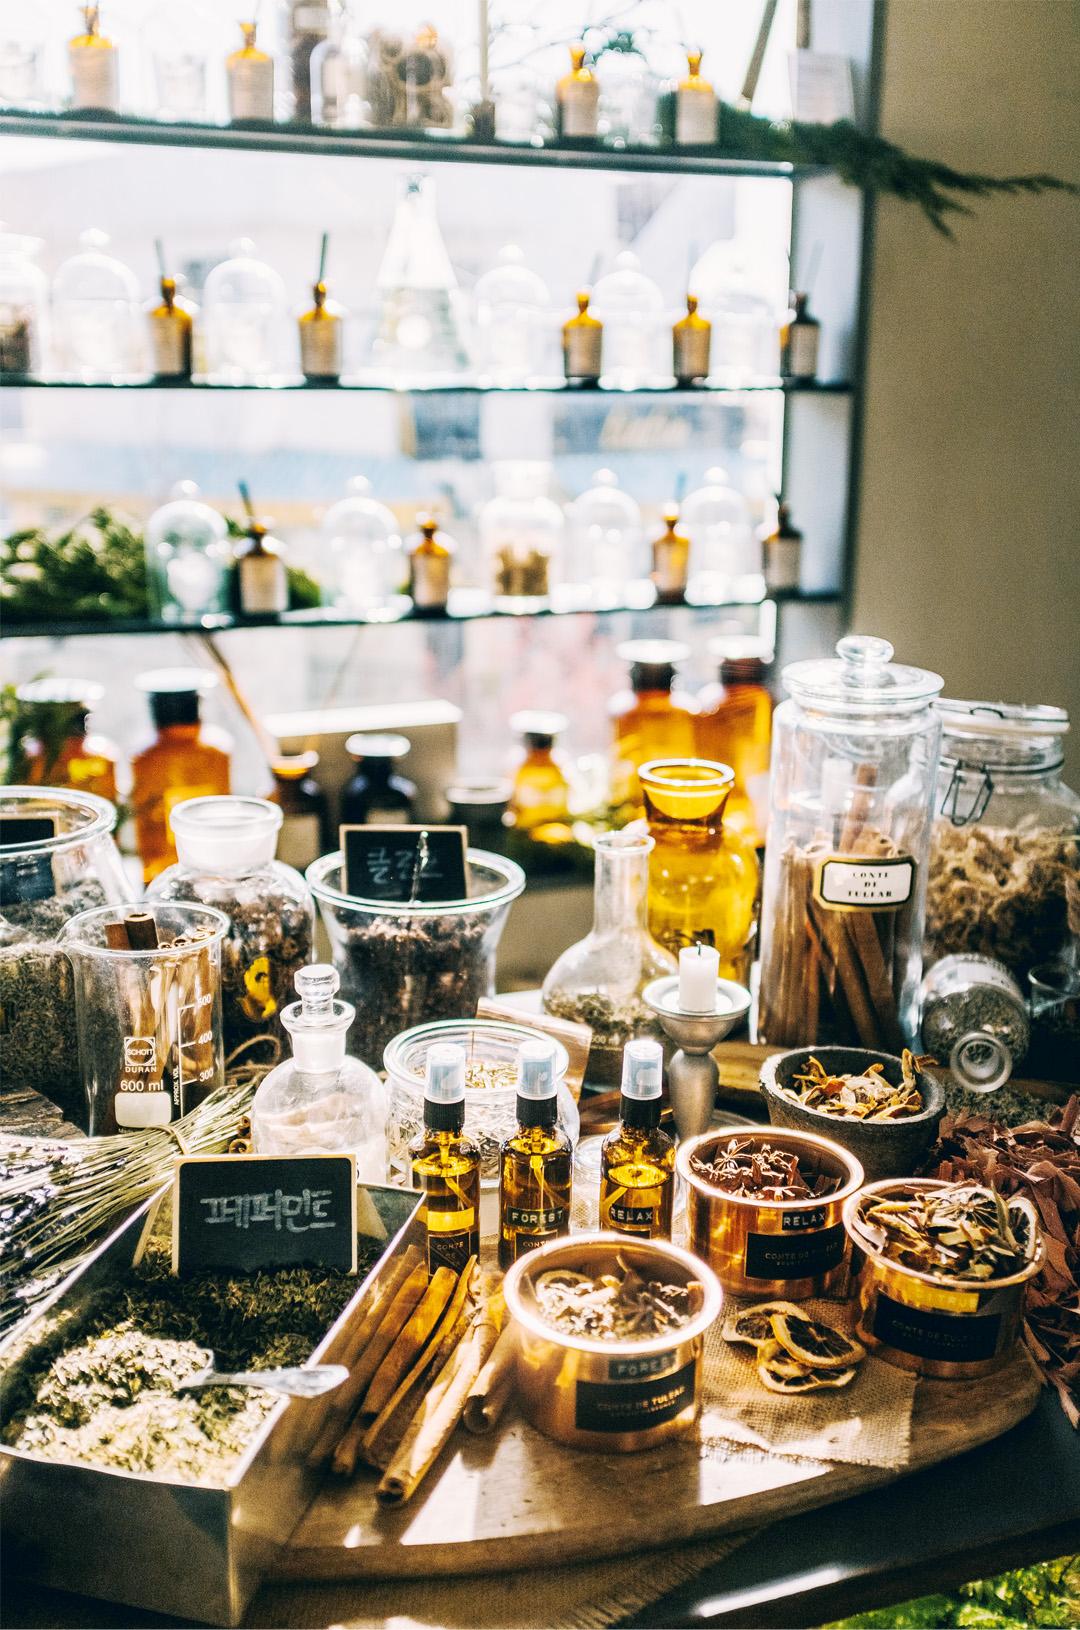 Perfume making